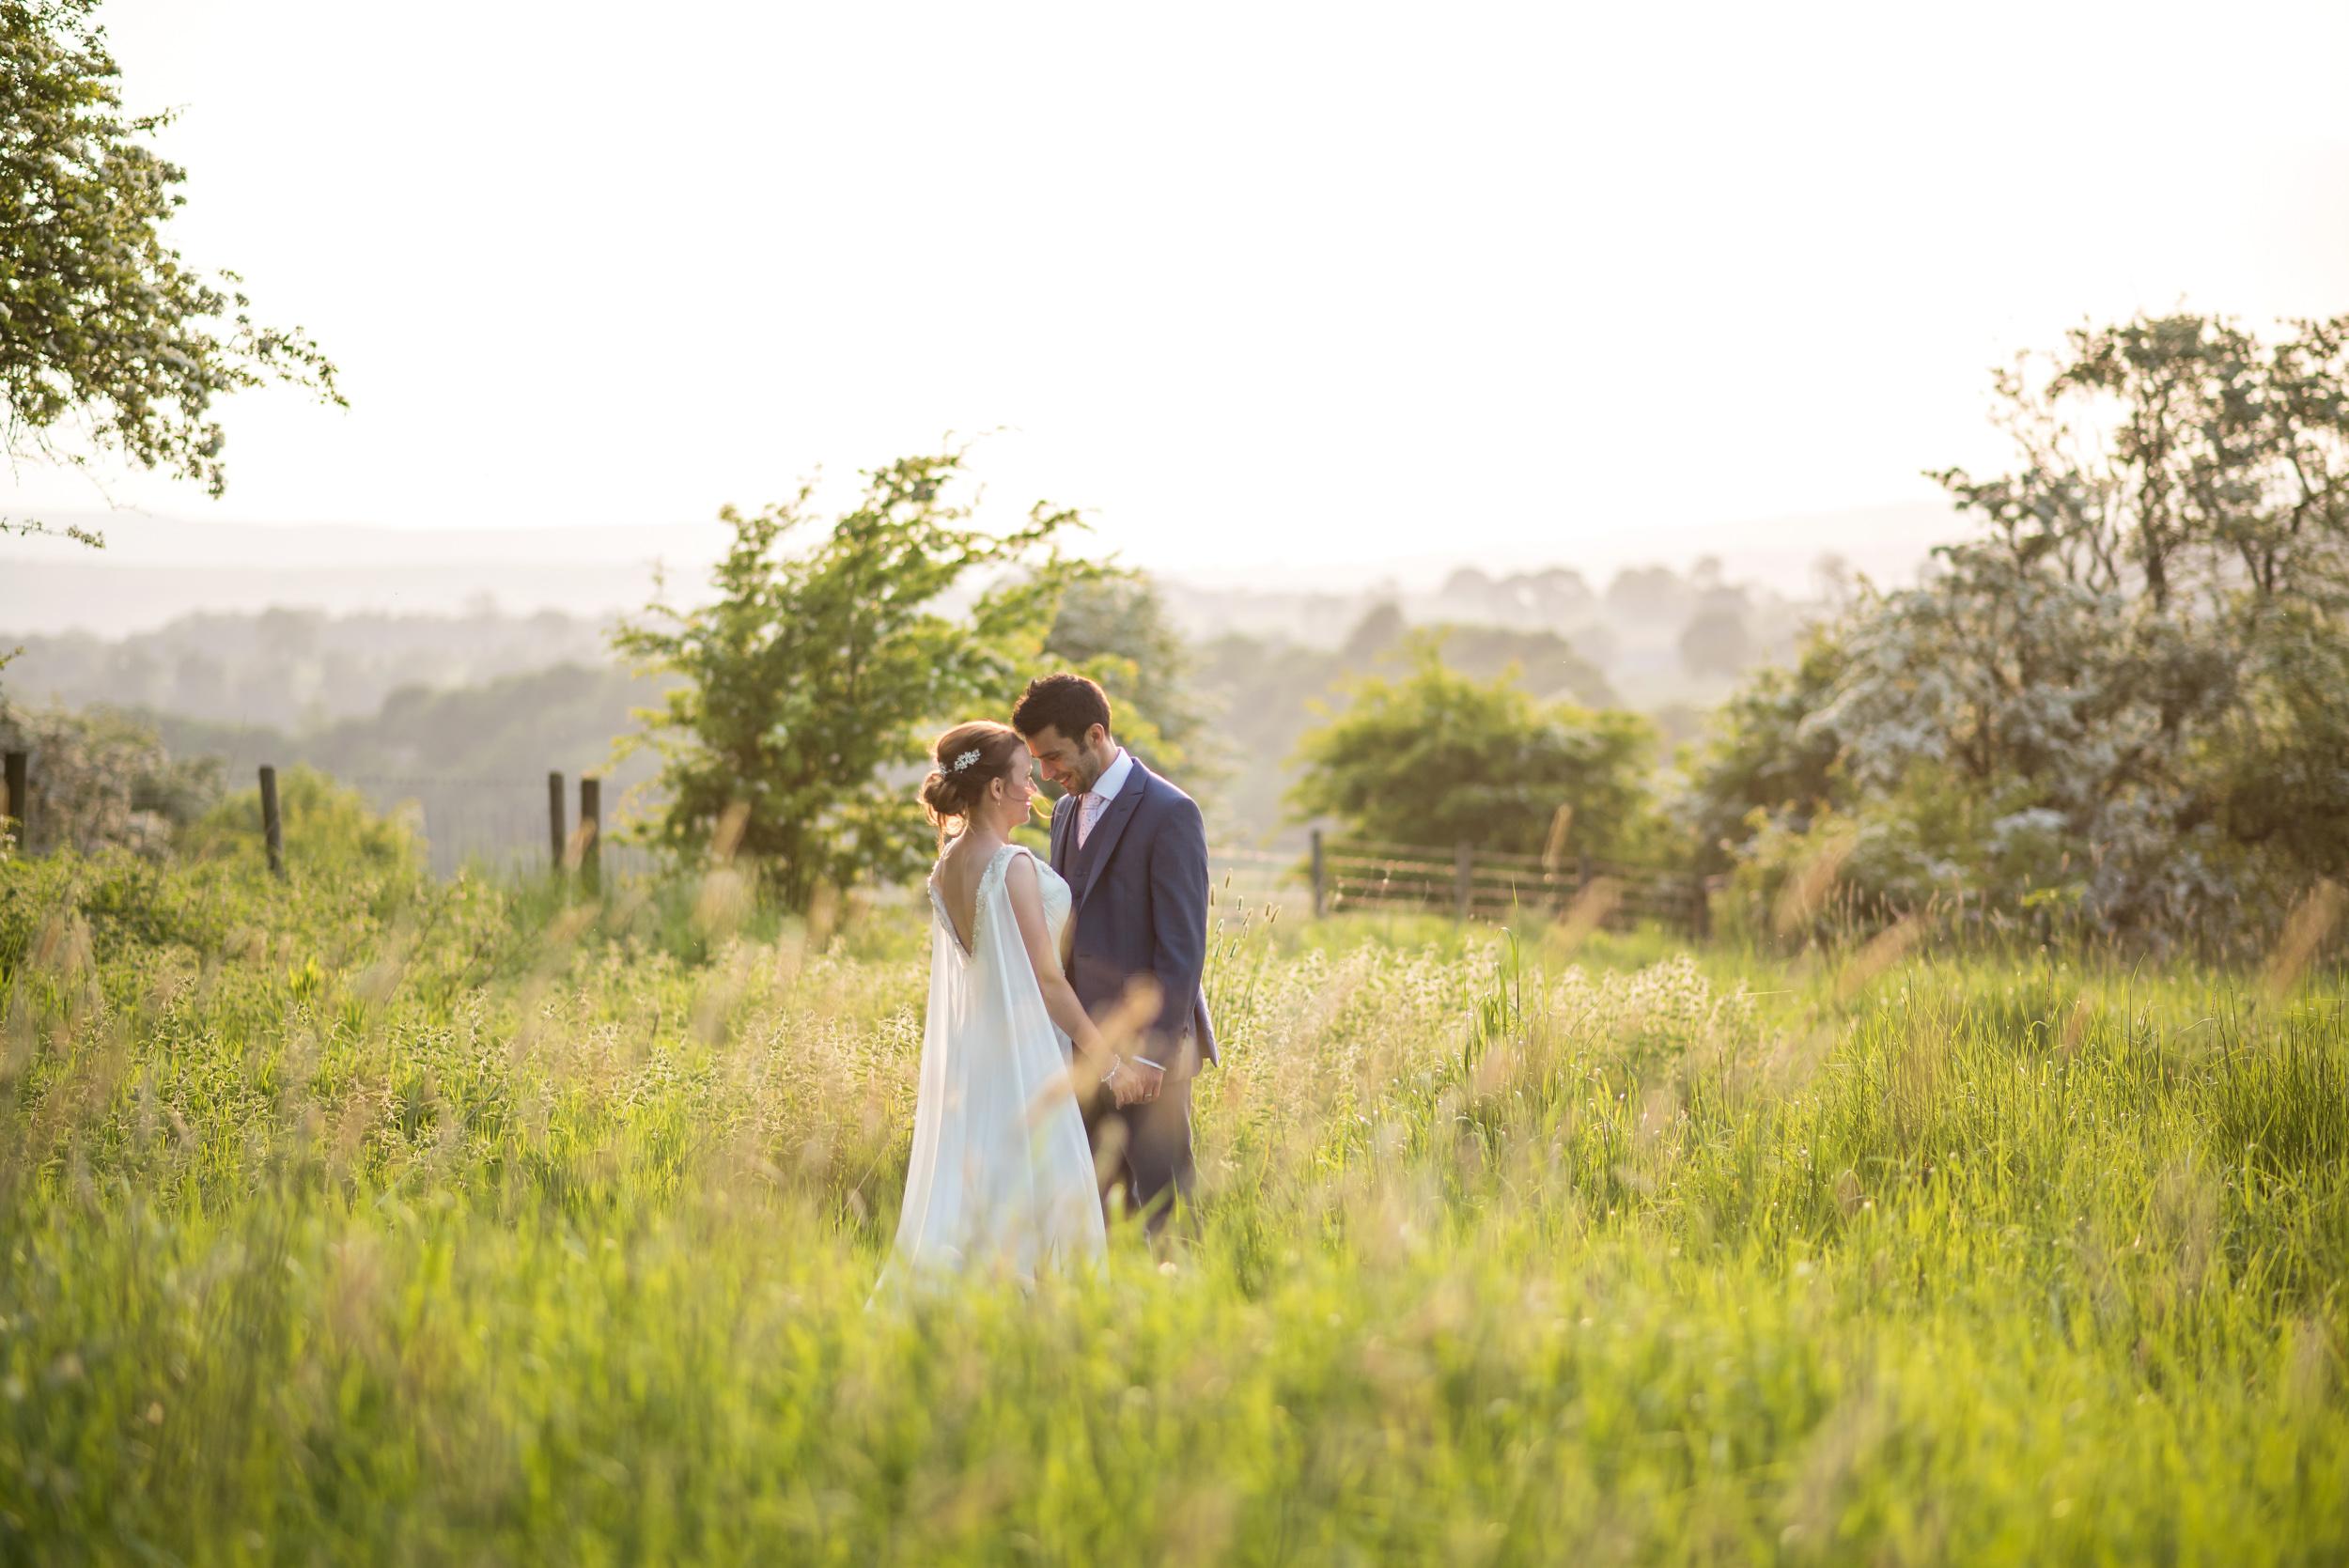 David Scholes Lancashire wedding photography 2016-110.jpg